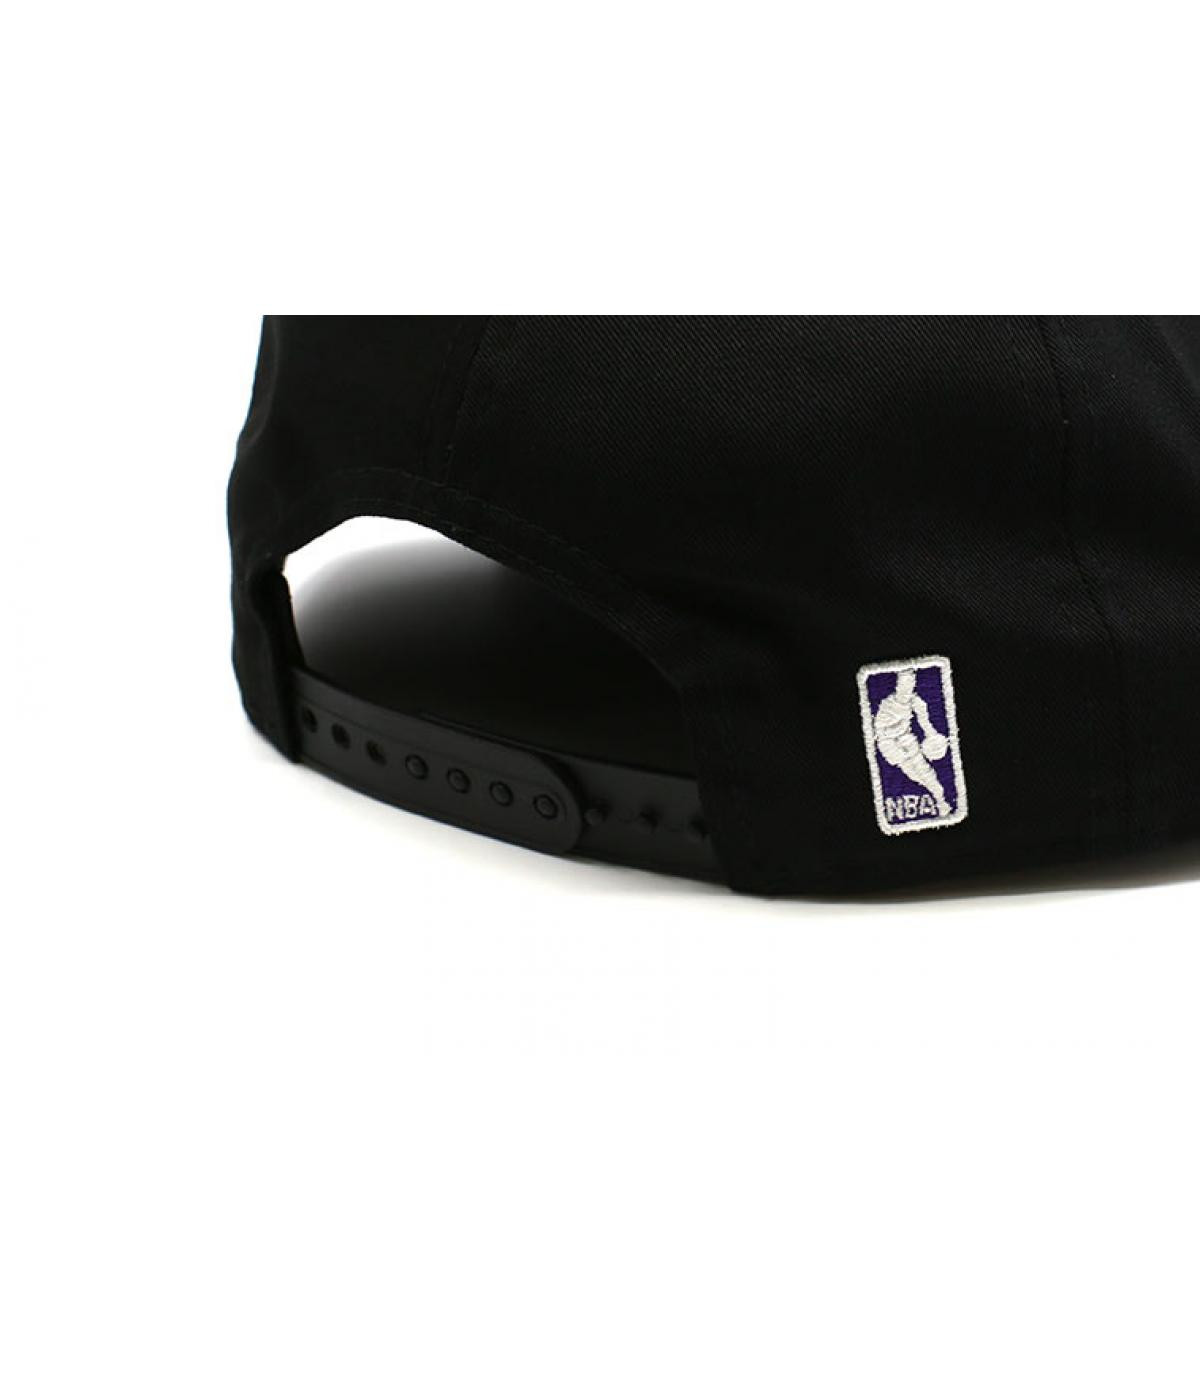 Details Snapback NBA Lakers 950 - Abbildung 5